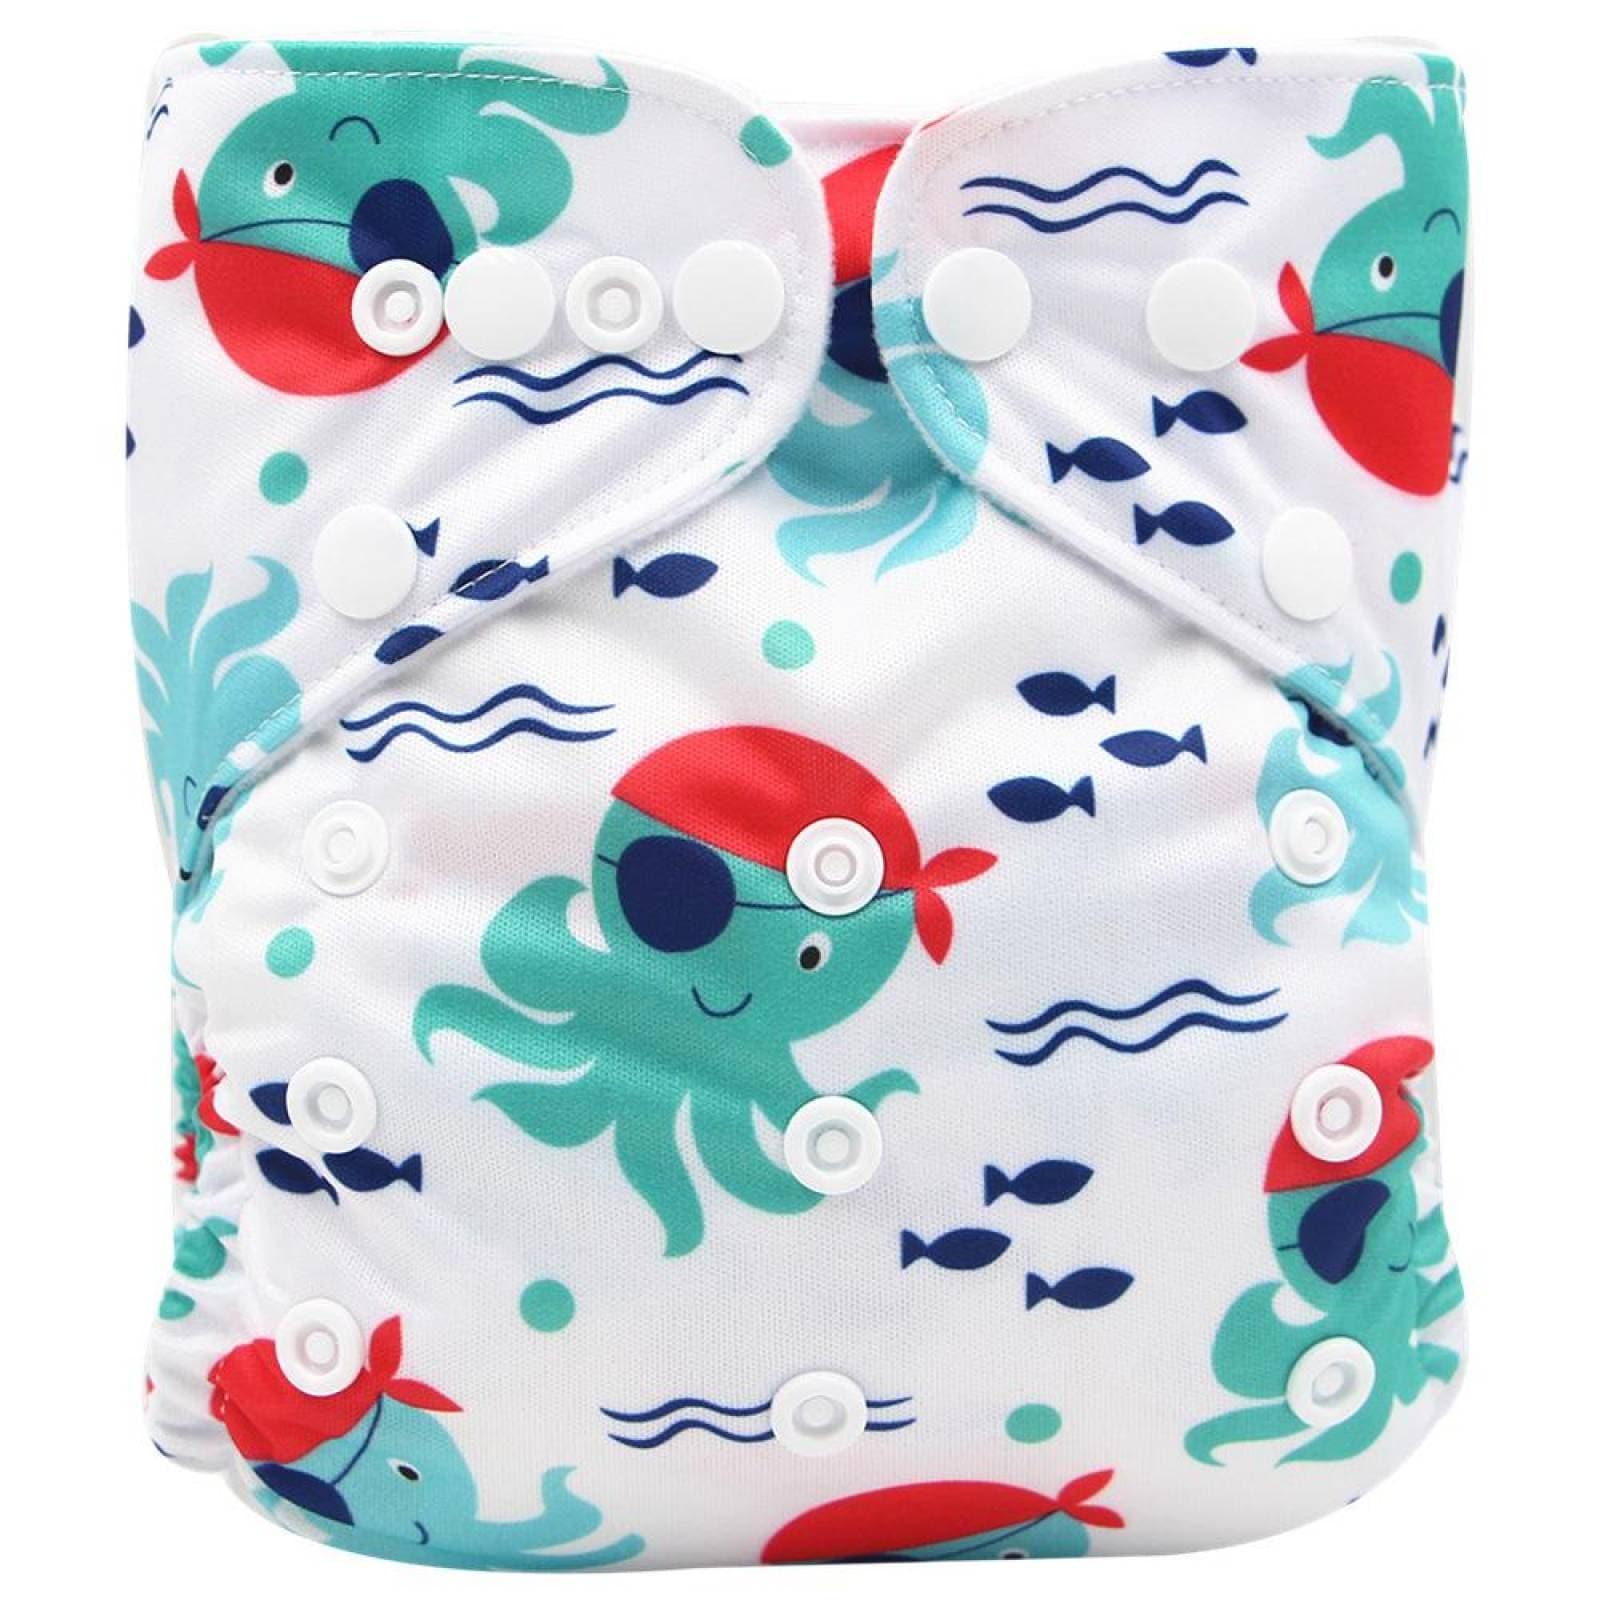 Pañal ecologico de tela reutilizable con Diseños 5 pañales 5 Insertos